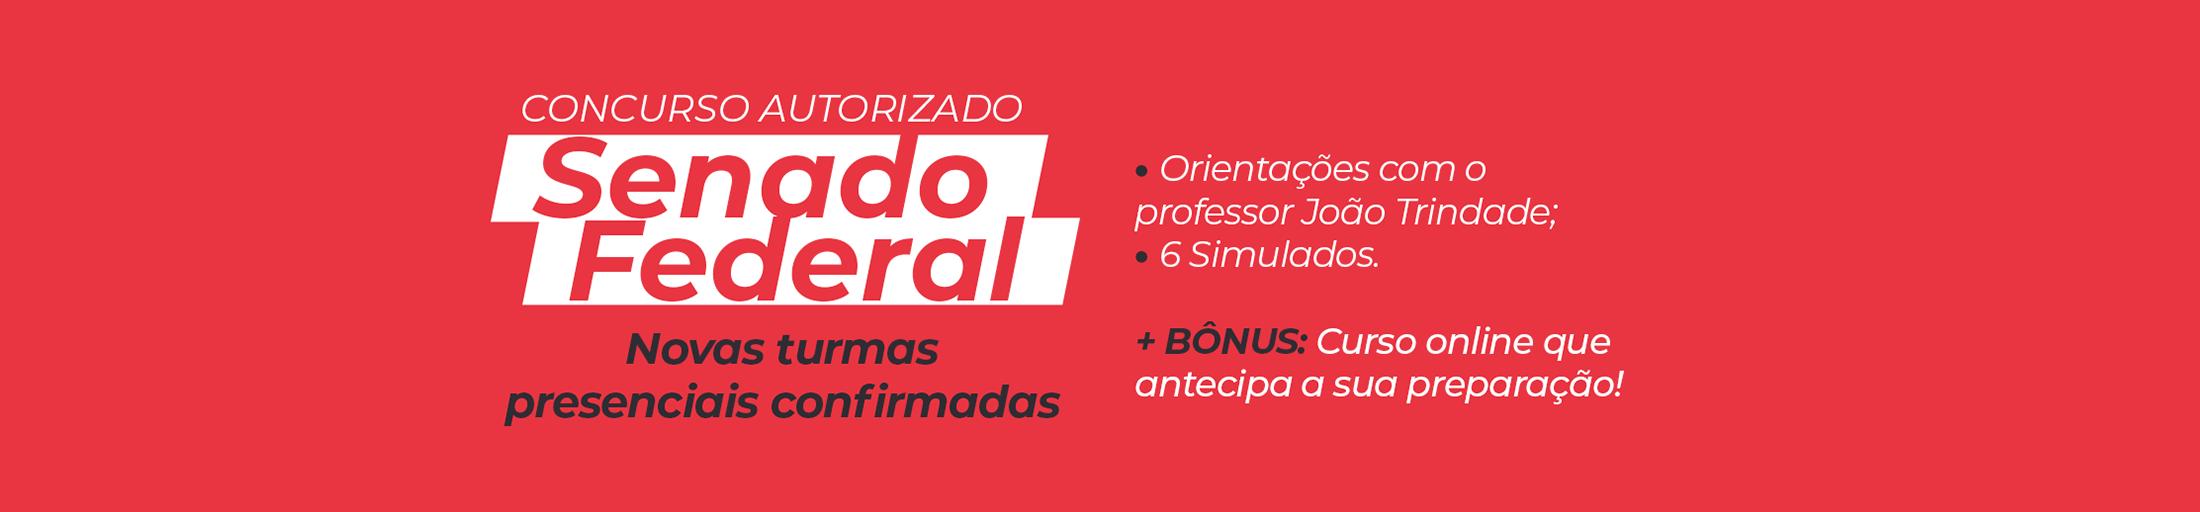 BANNER_SITE_-_SENADO_CONCURSO_AUTORIZADO_PRESENCIAL_1